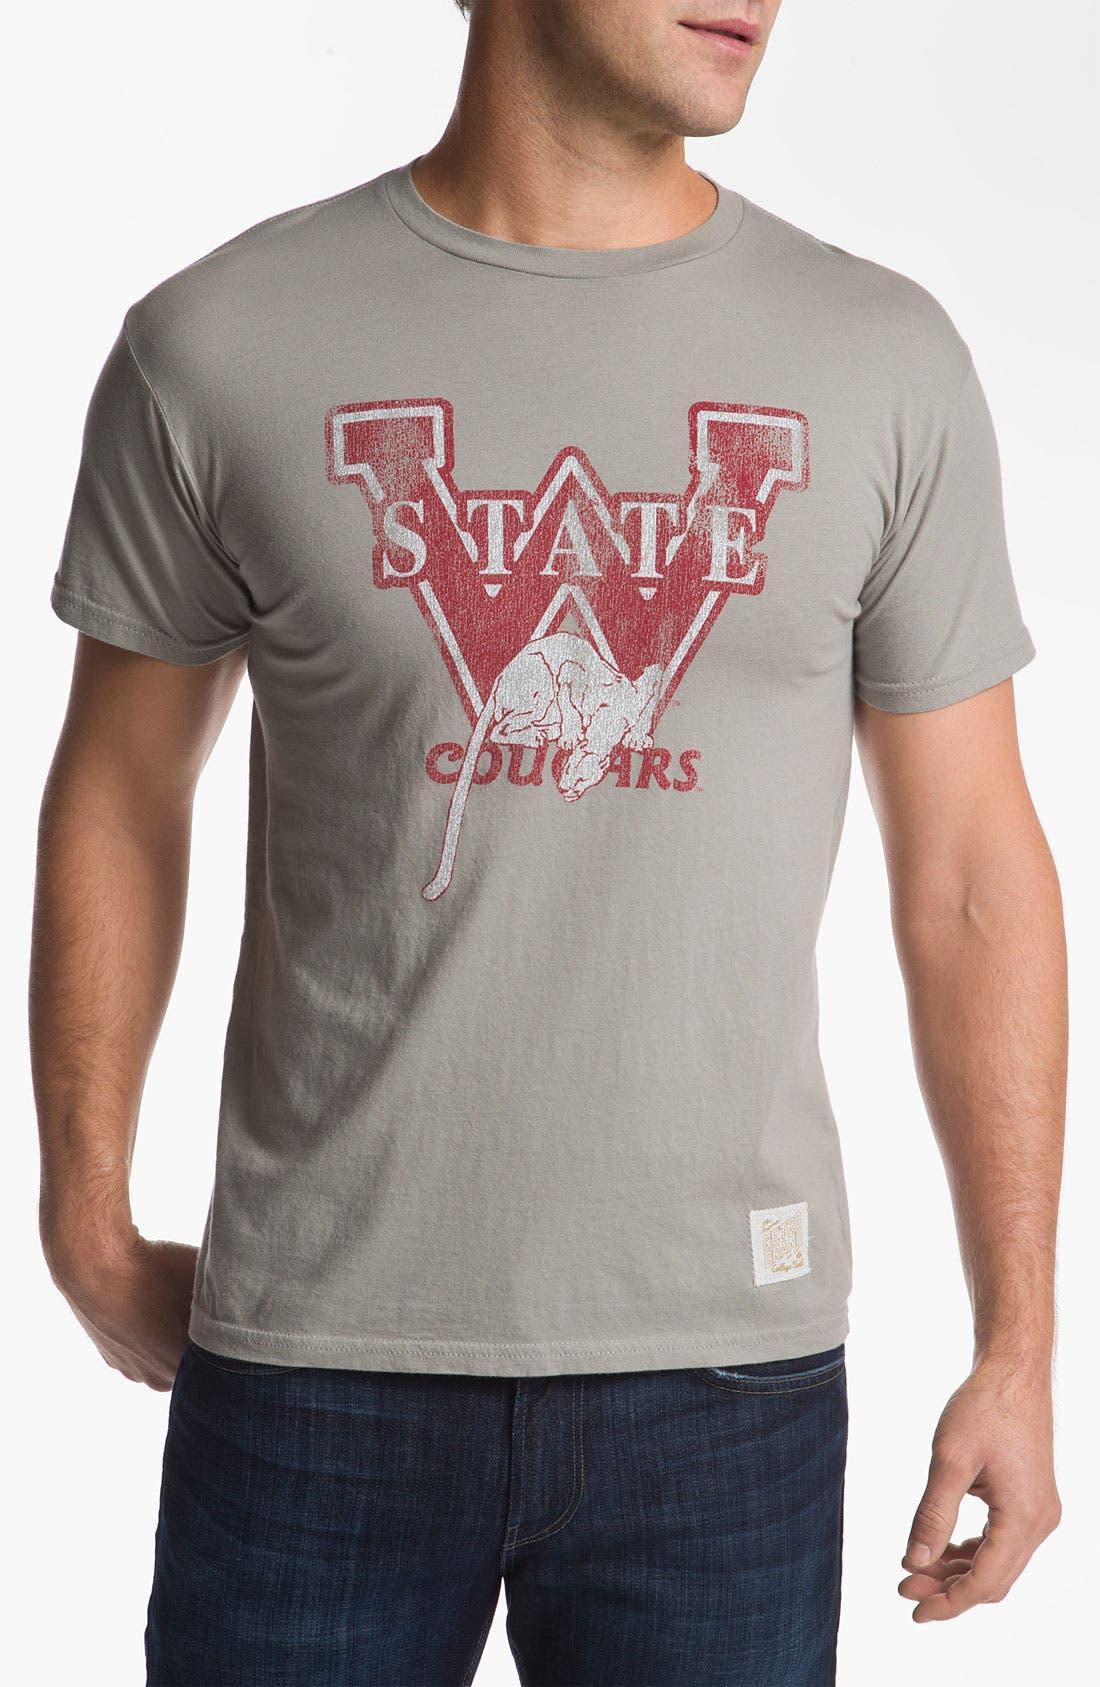 Alternate Image 1 Selected - The Original Retro Brand 'Washington State Cougars' T-Shirt